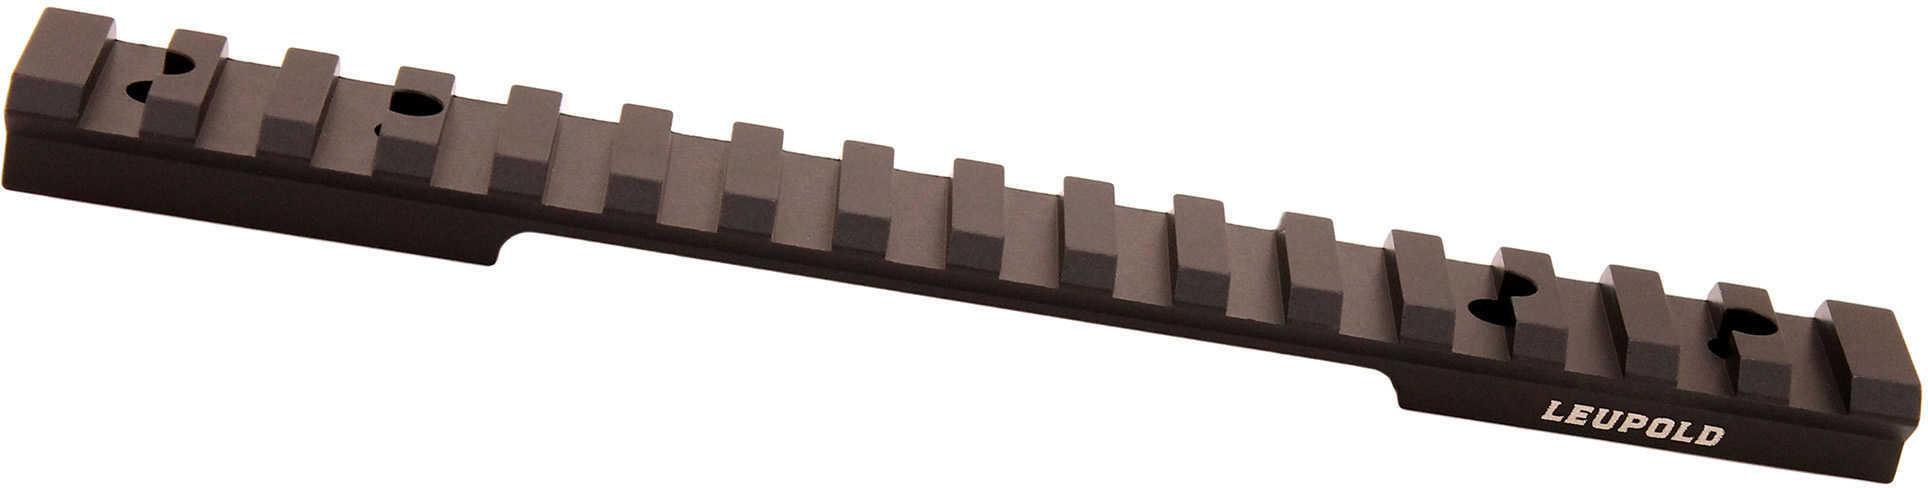 Leupold BackCountry Cross-Slot 1 Piece Base Ruger® American, Long Action, 20 MOA, Matte Black Md: 171361